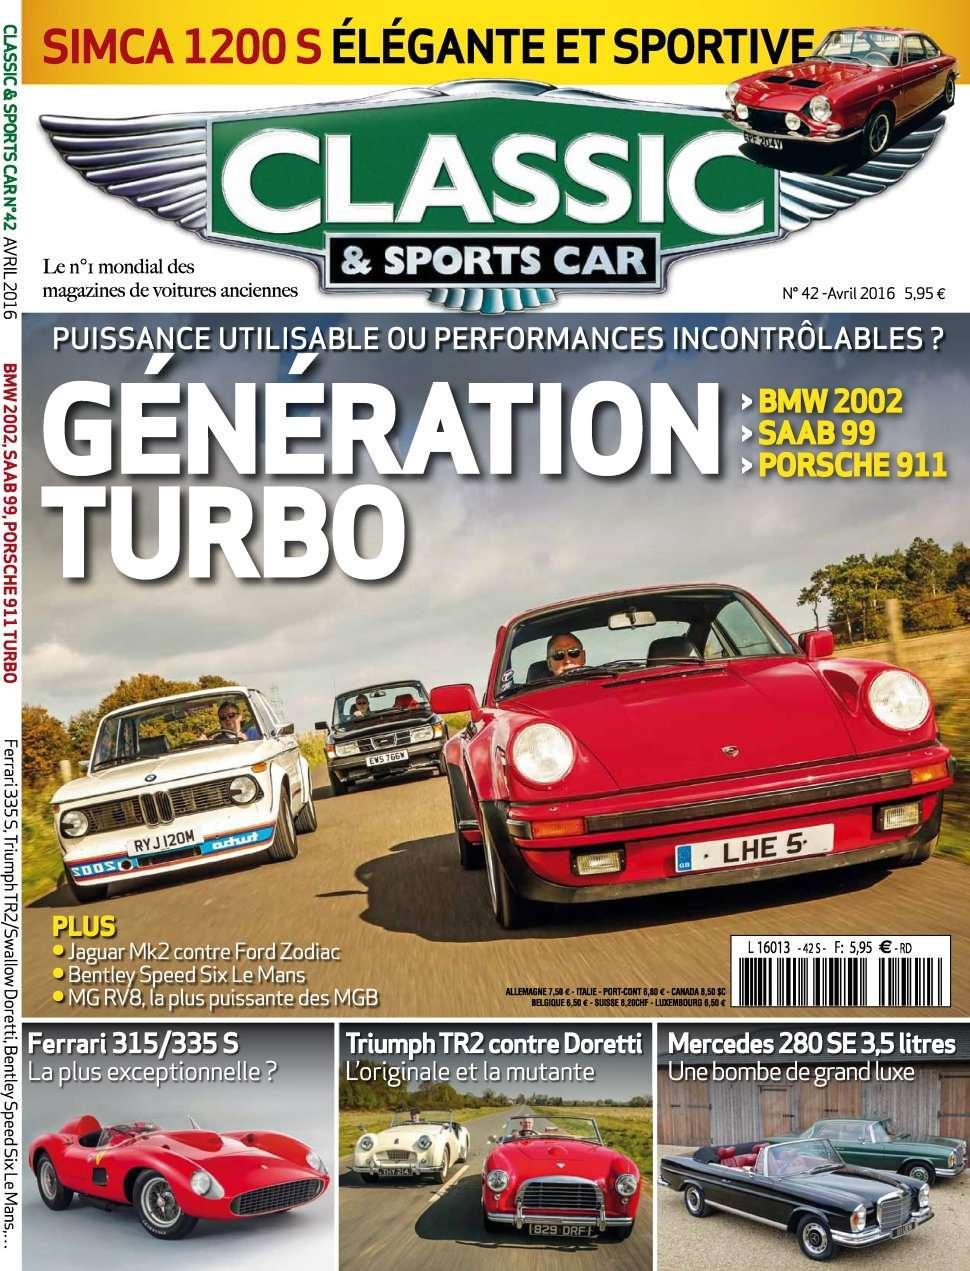 Classic & Sports Car 42 - Avril 2016